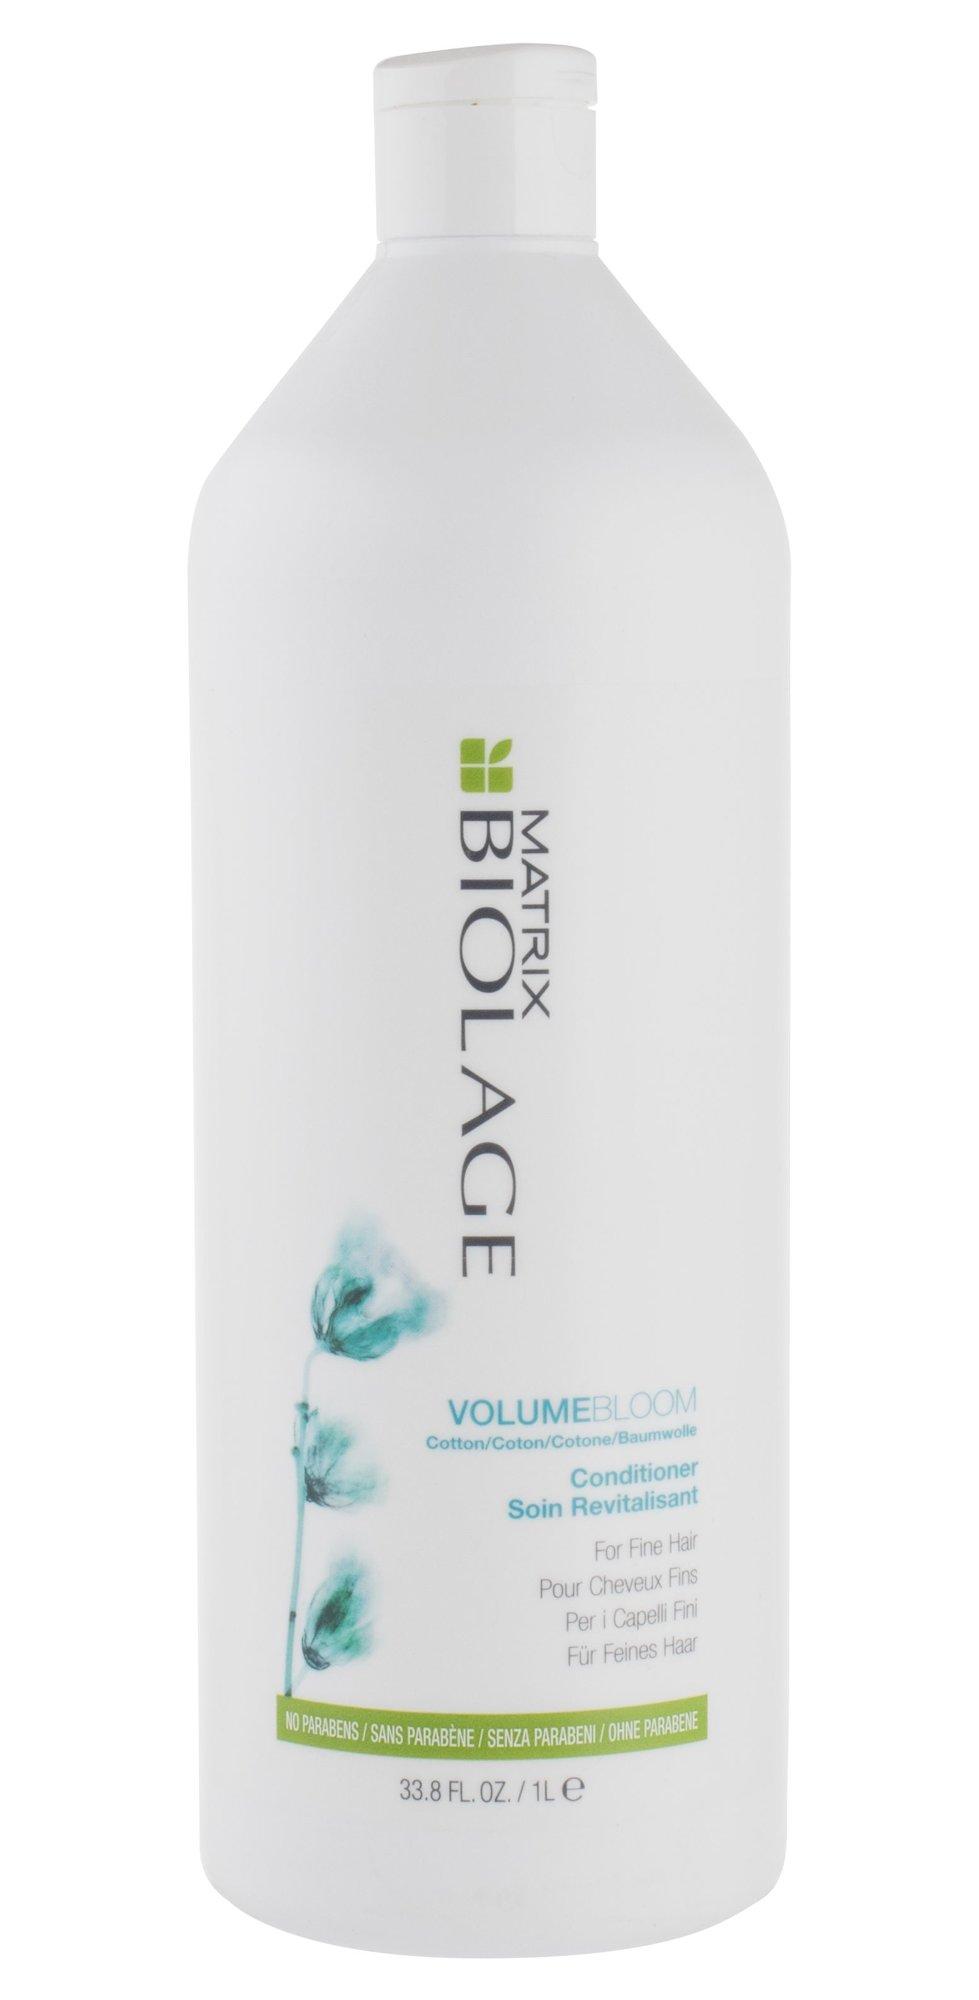 Matrix Biolage Volumebloom Cosmetic 1000ml